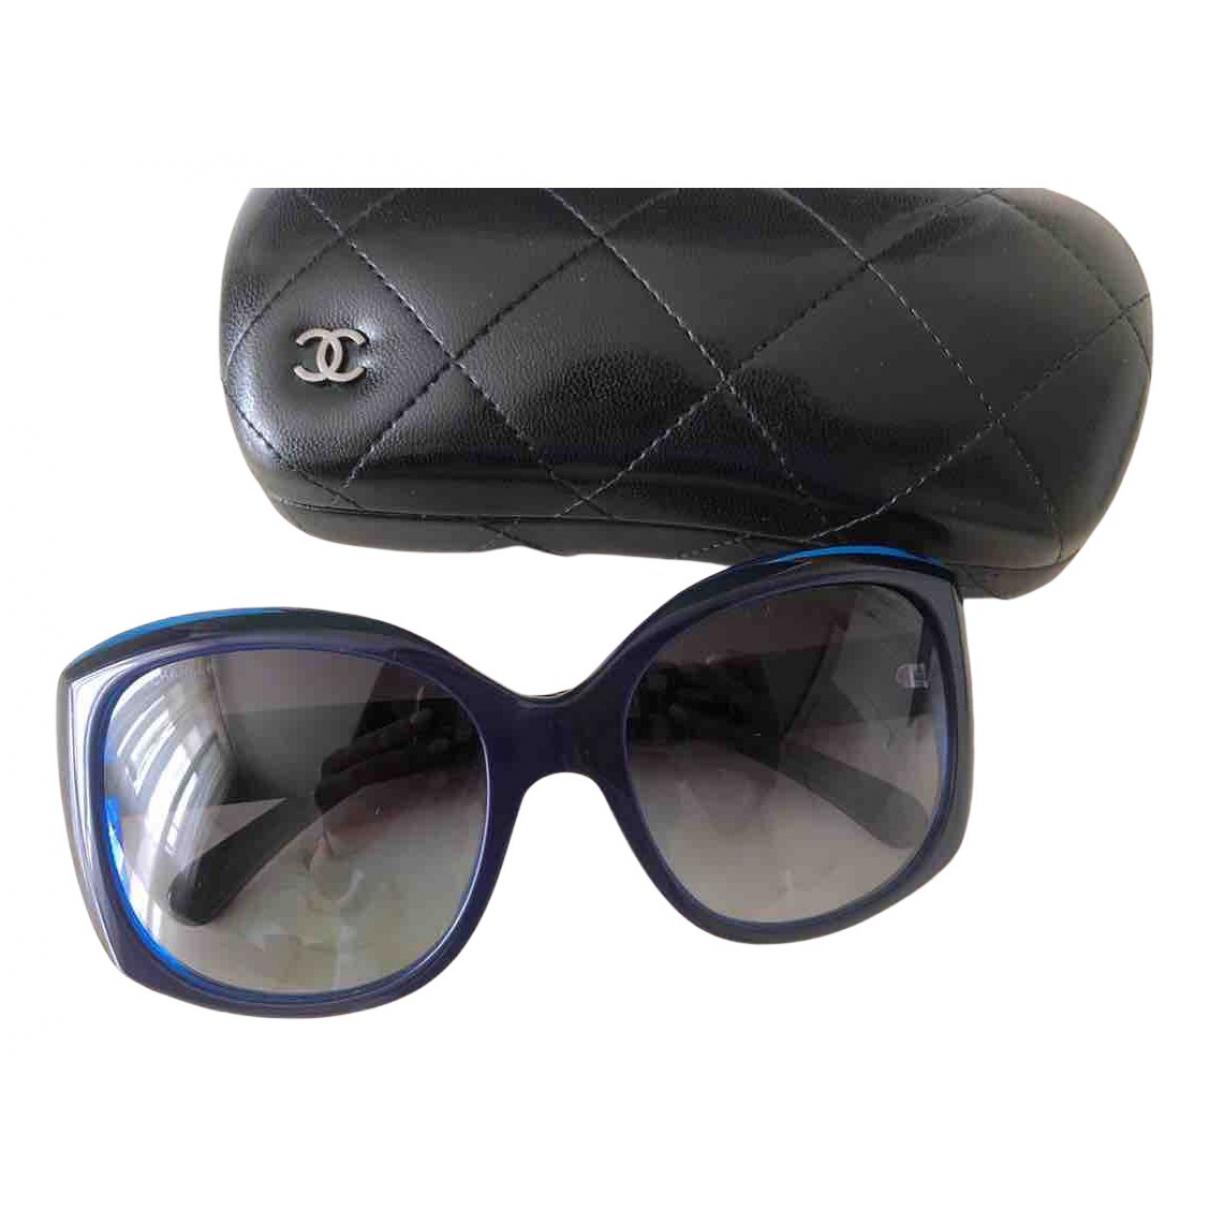 Chanel \N Sonnenbrillen in  Blau Kunststoff